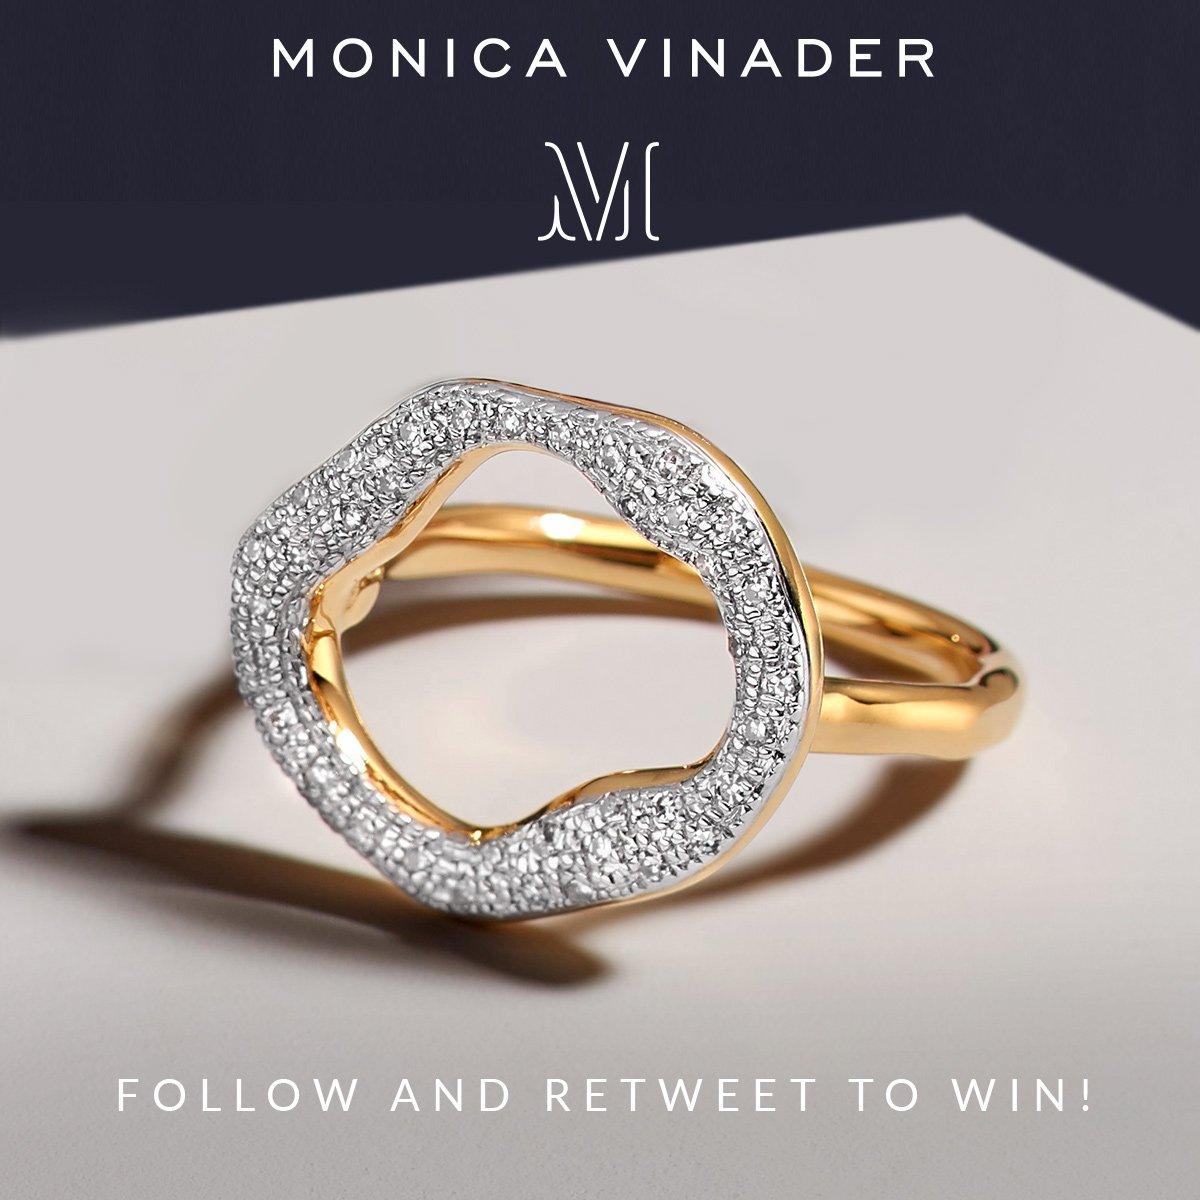 Follow us & RT to #win a new @MonicaVinader Riva Diamond Circle Ring! T&C's Apply: https://t.co/yBkk60QbwD https://t.co/1ZQmvbHGPC